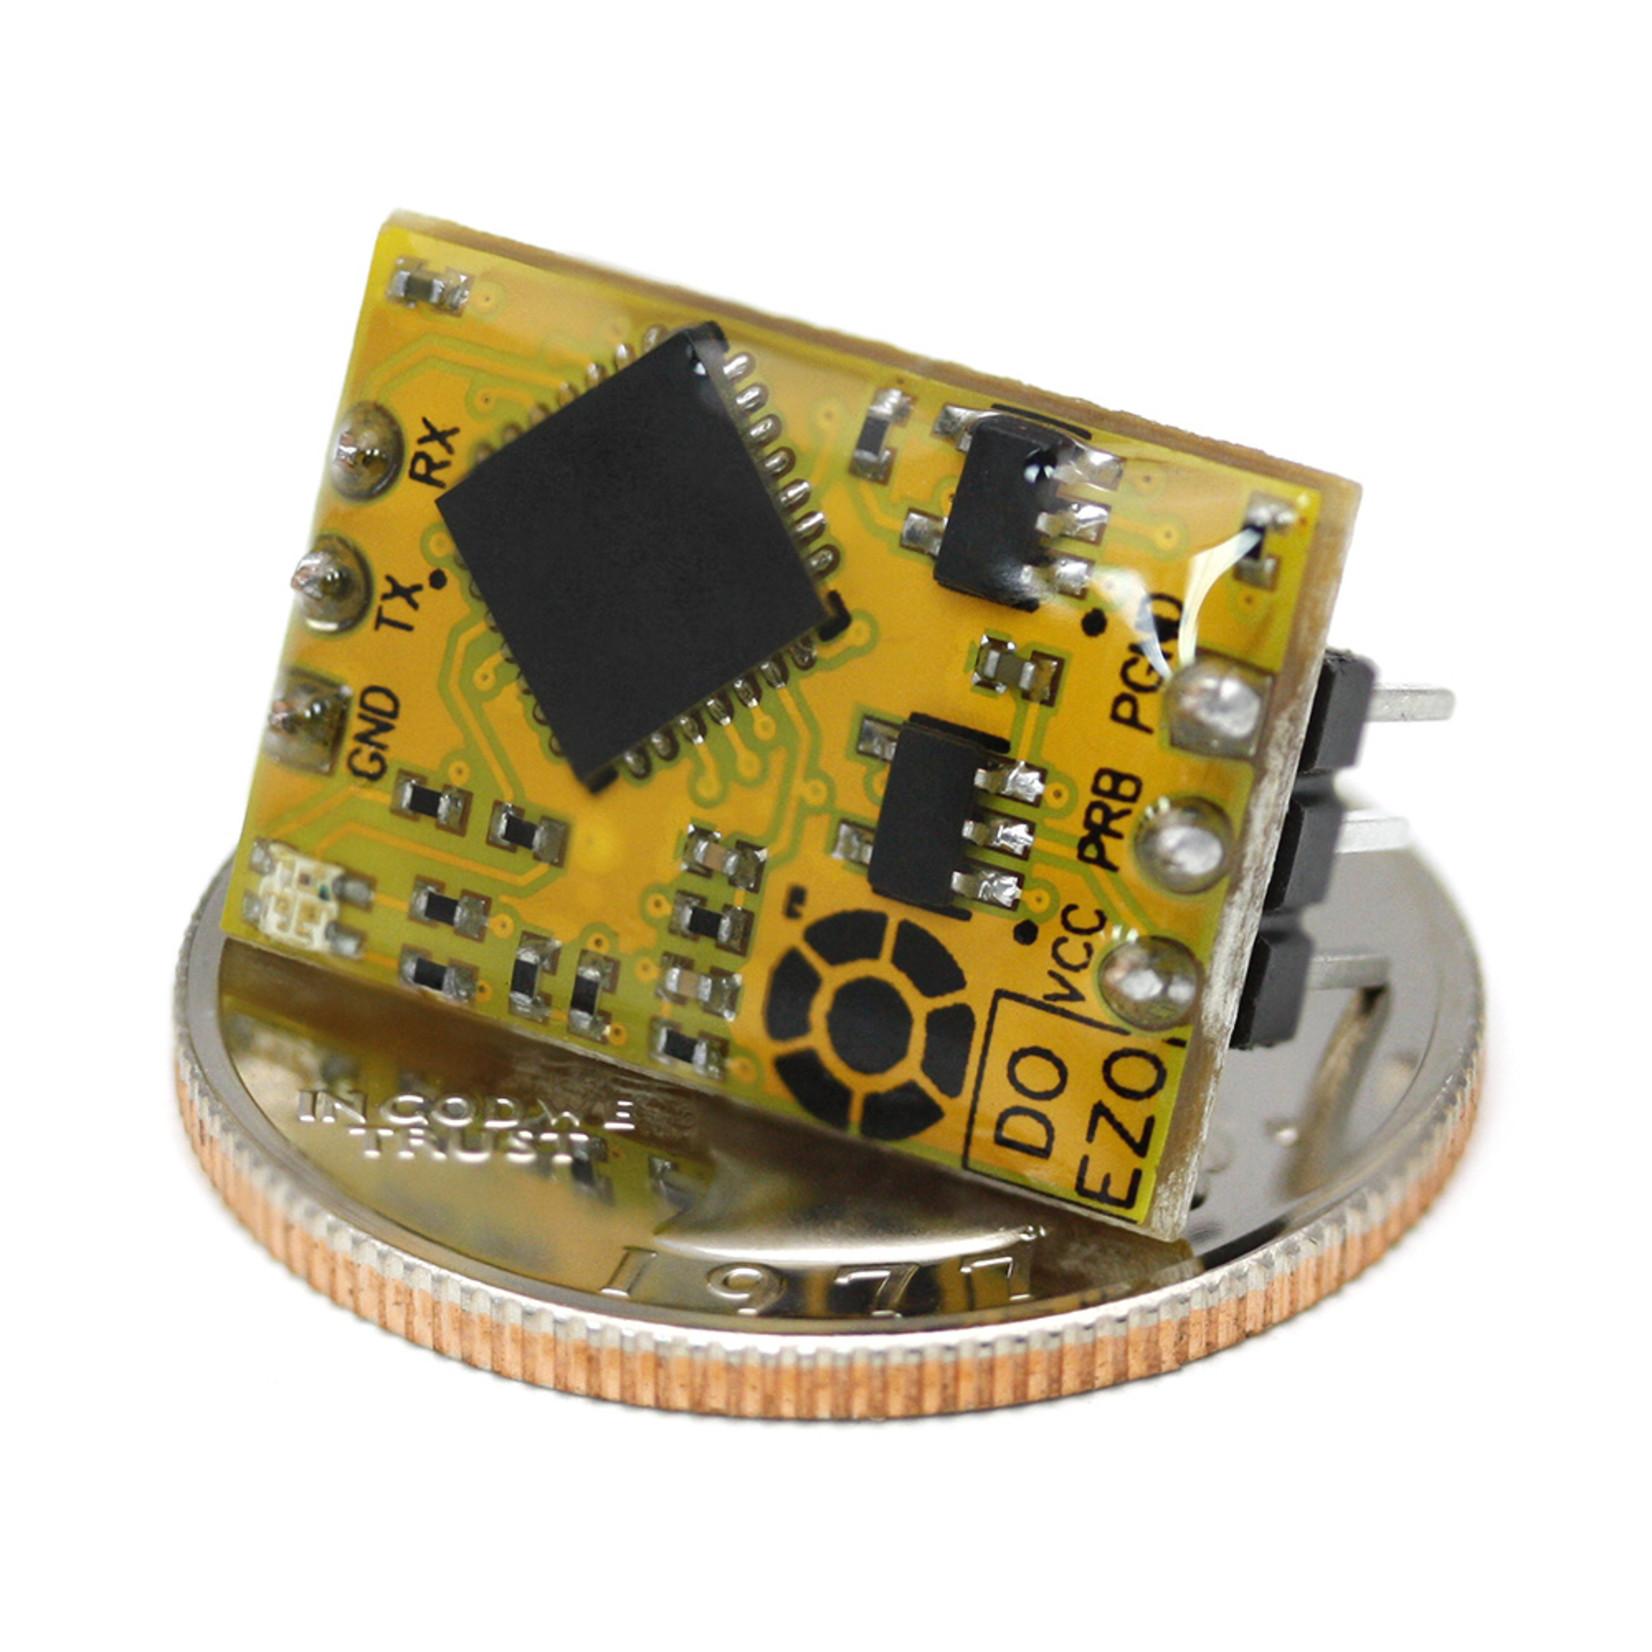 Atlas Scientific EZO™ Opgeloste Zuurstof Circuit